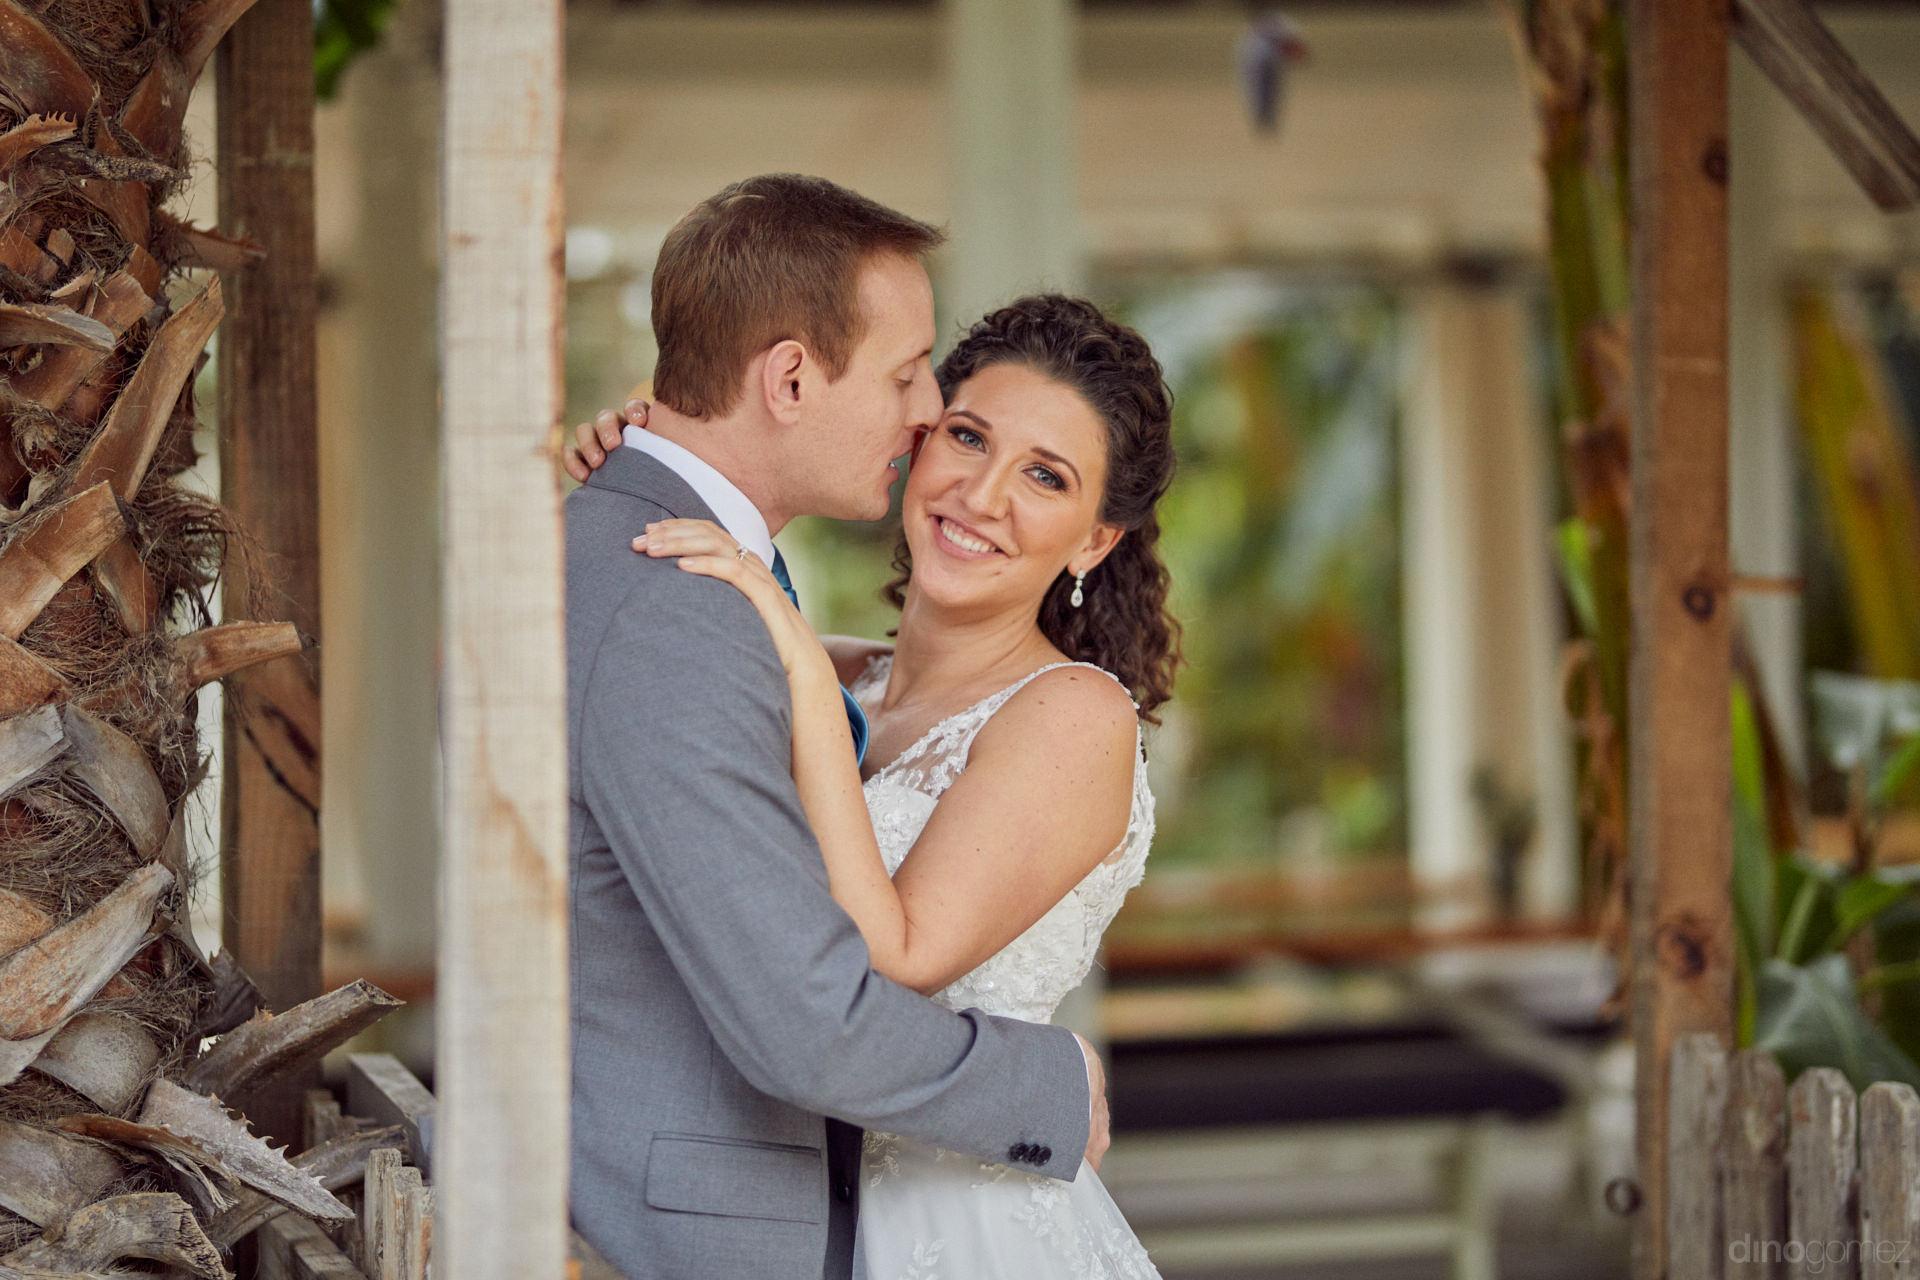 Wedding Photographers Cabo San Lucas Mexico - Hilary & Bryan Flora Wedding